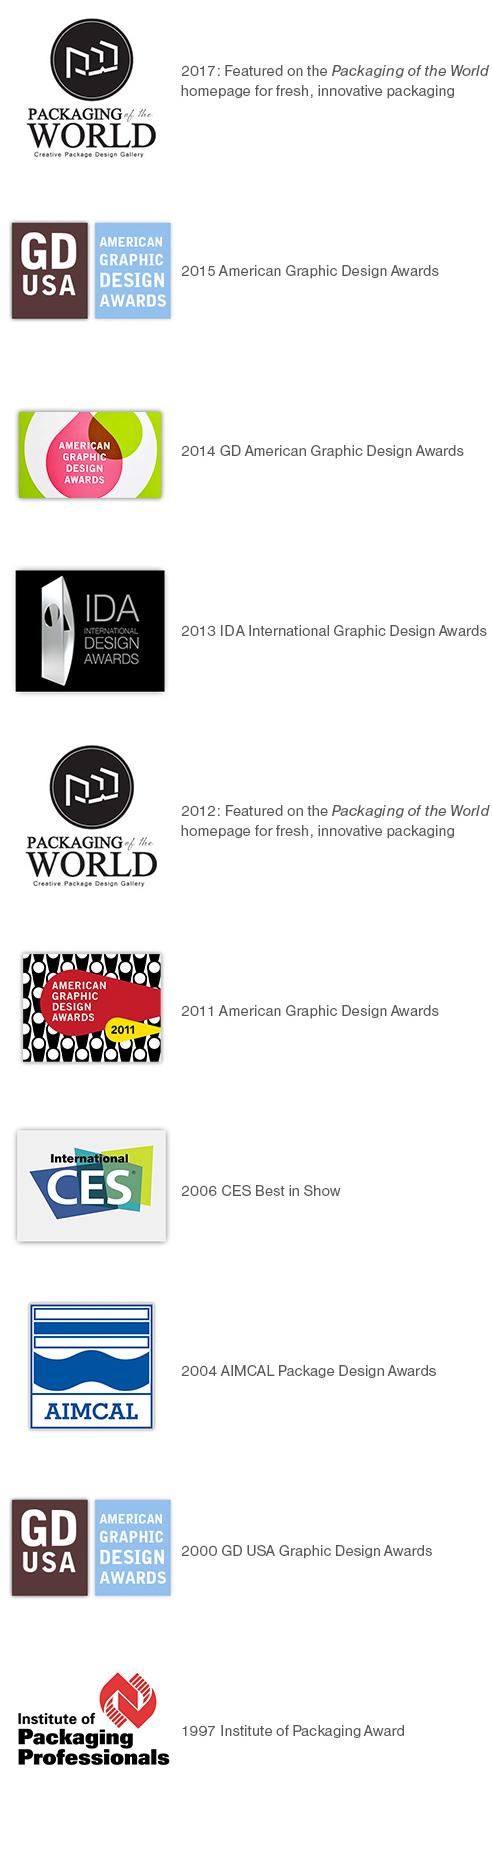 Award-winning-package-design-agency-in-san-diego-california-lien-design-4.jpg